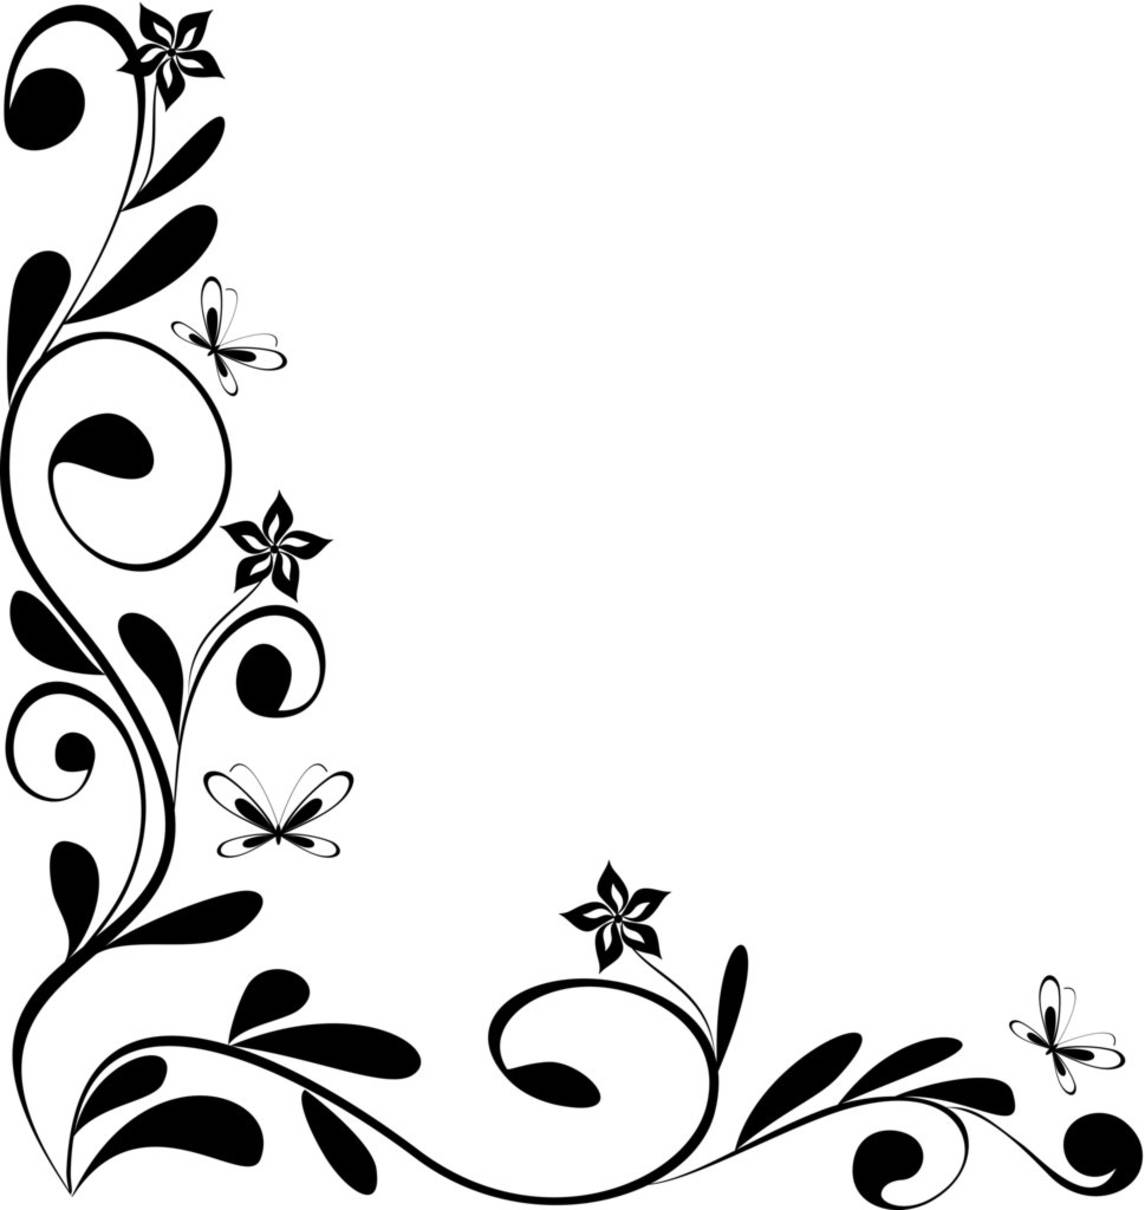 Corner Swirl Clip Art At Clke